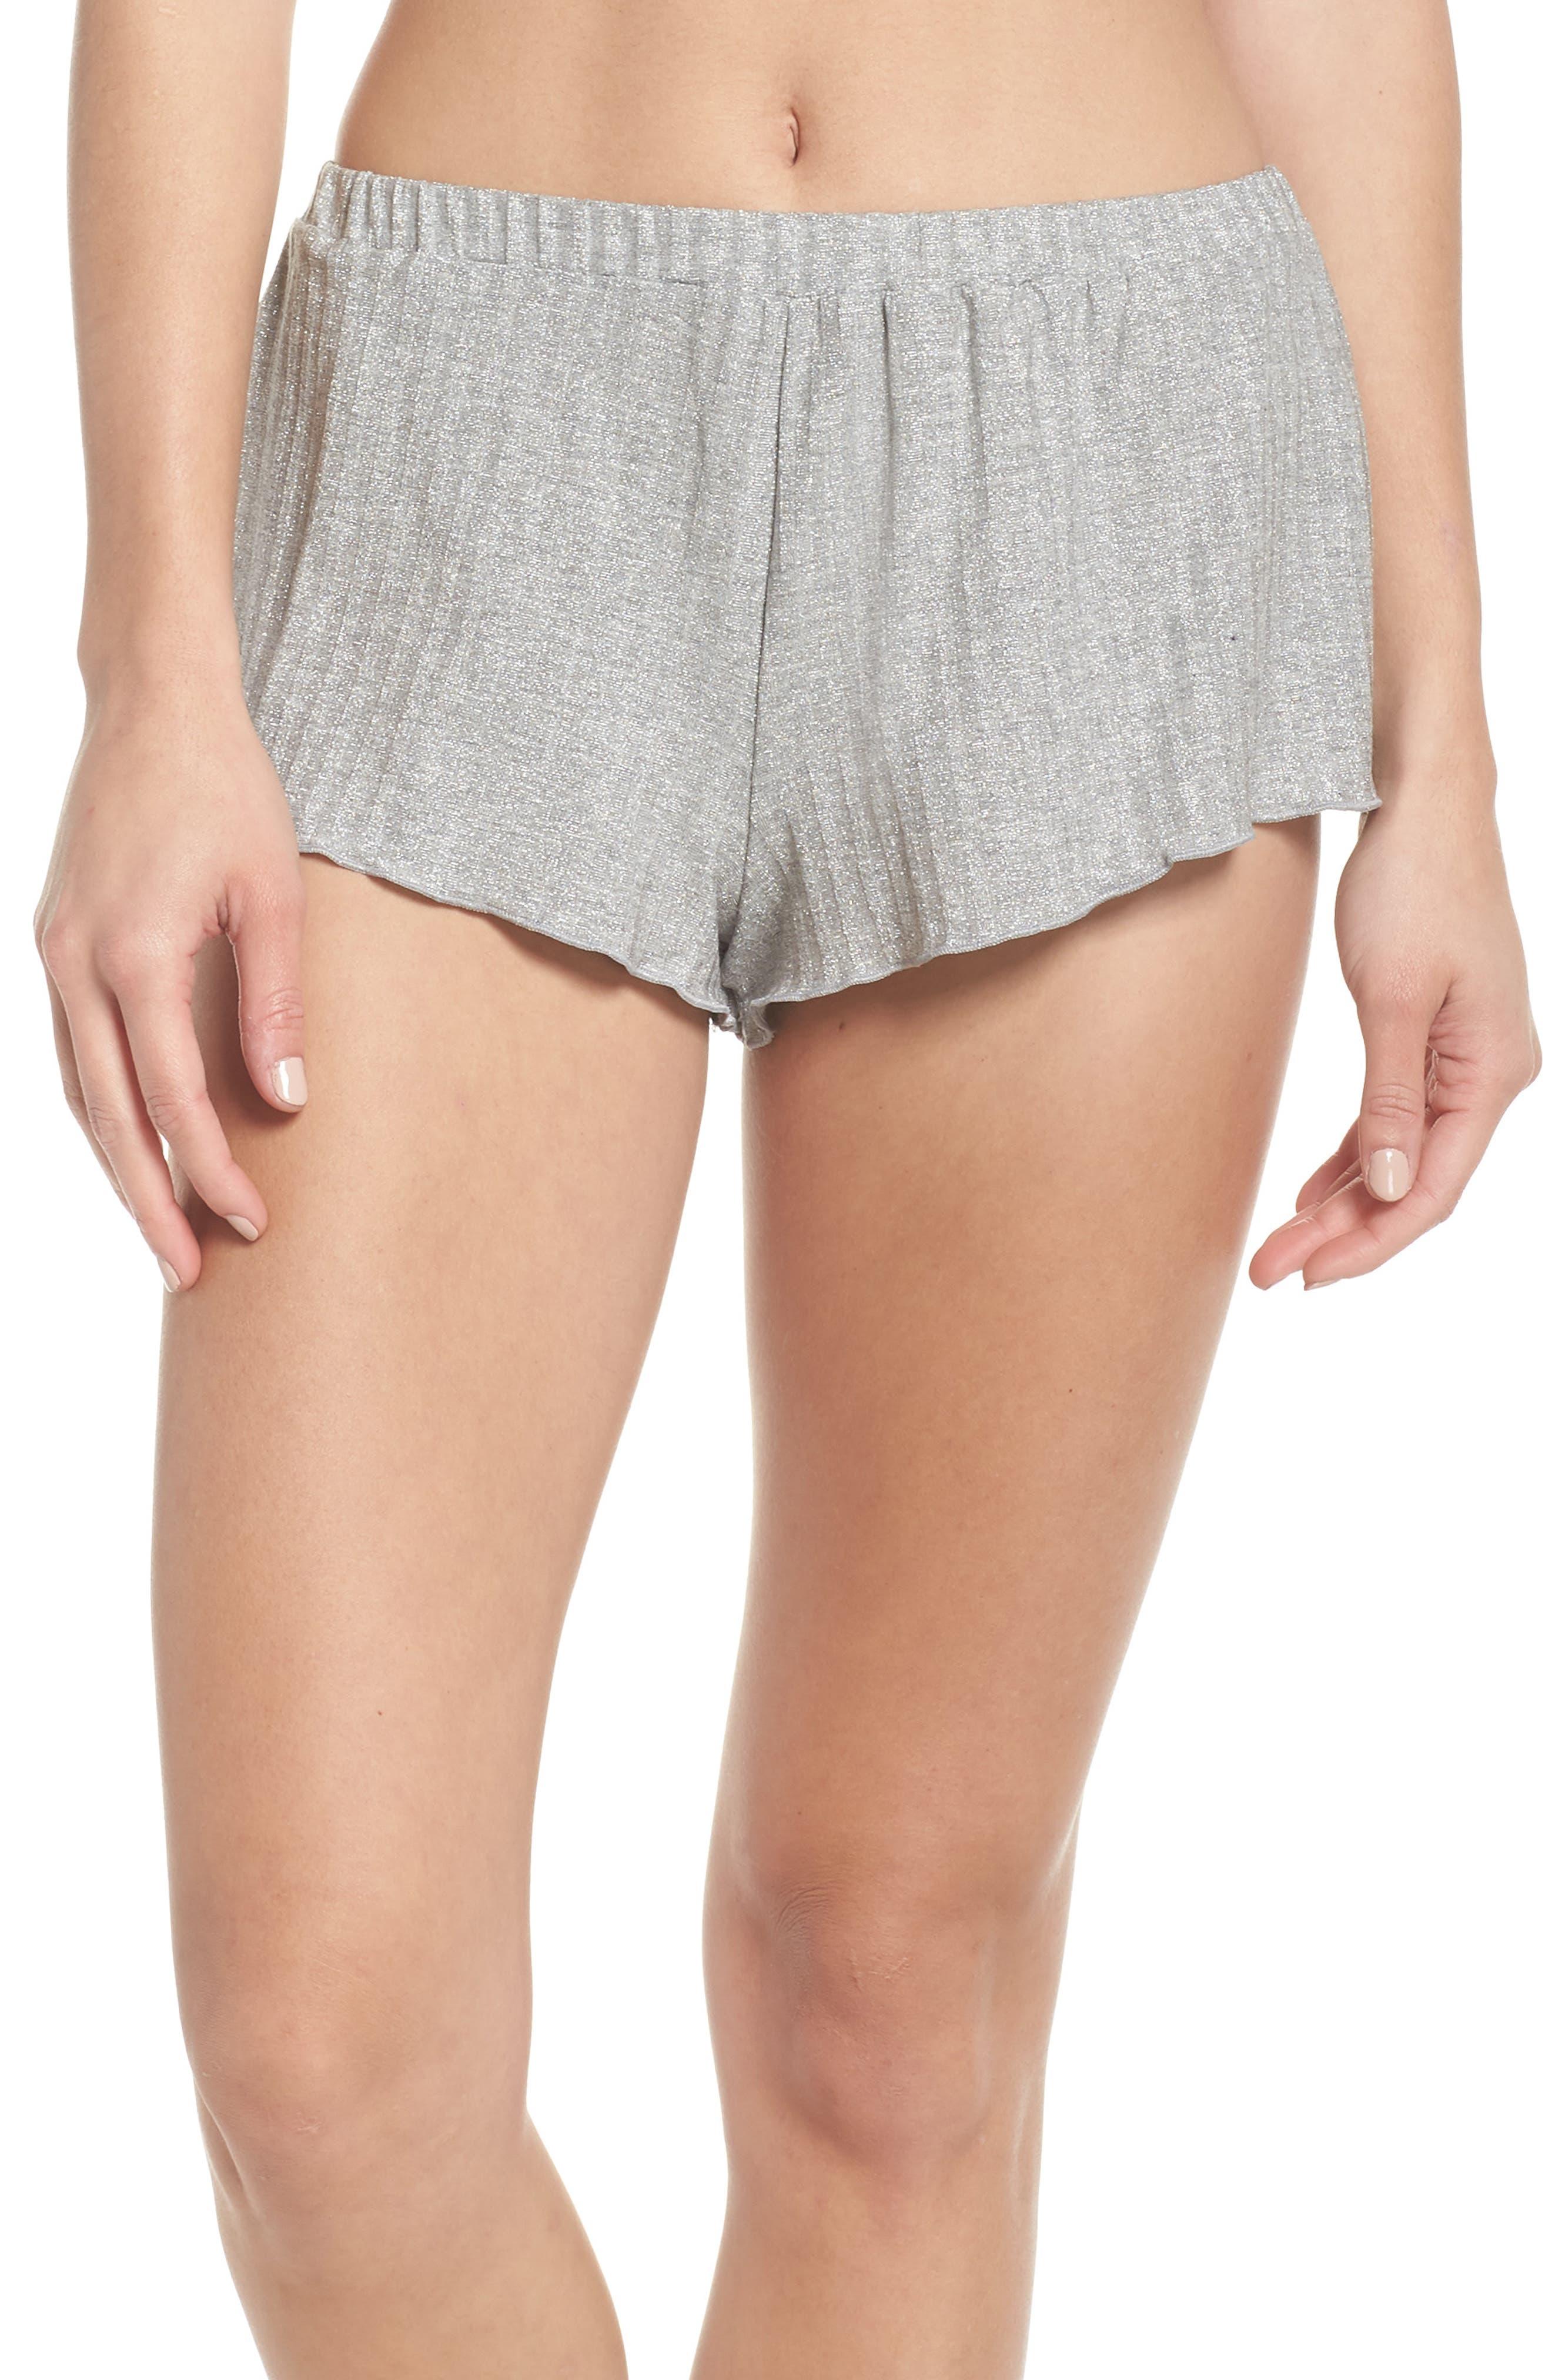 Cosabella Minimalista Tap Shorts